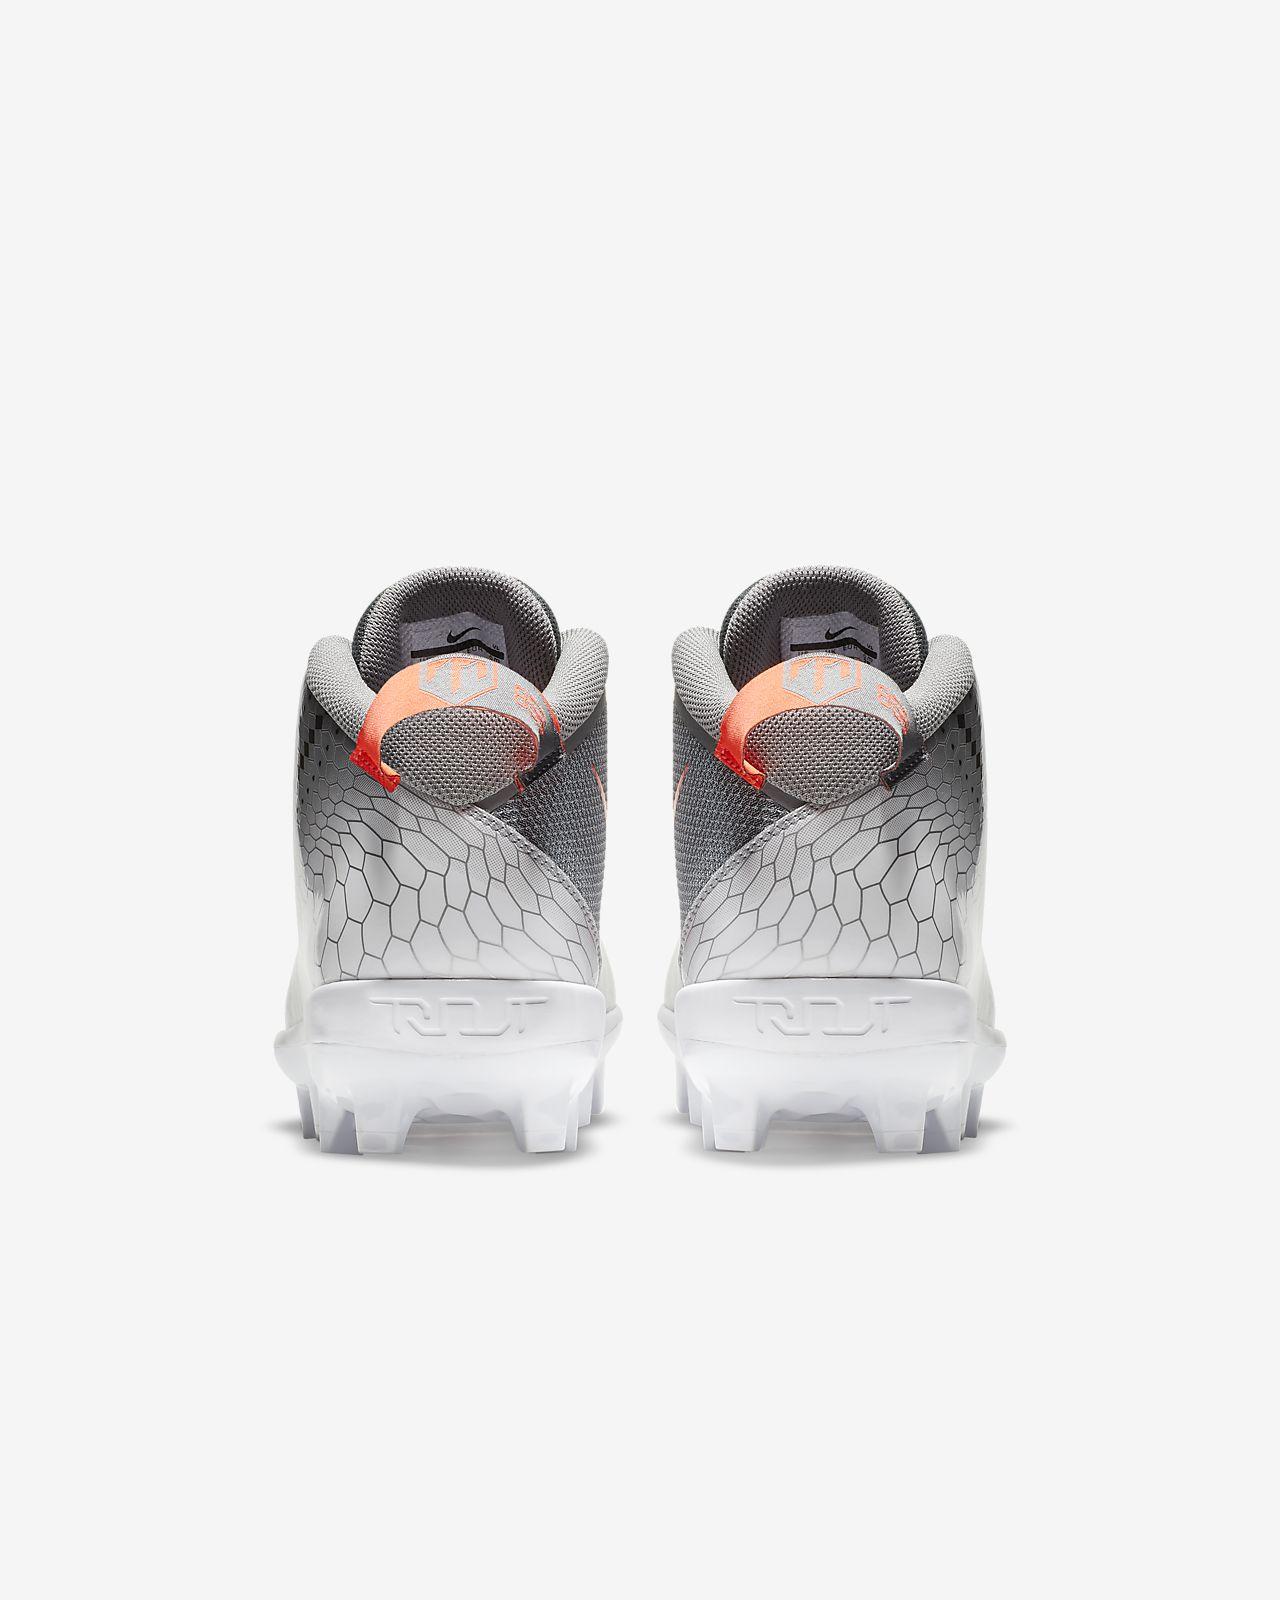 best website 9b681 8c137 ... Nike Force Zoom Trout 5 Pro MCS Men s Baseball Cleat